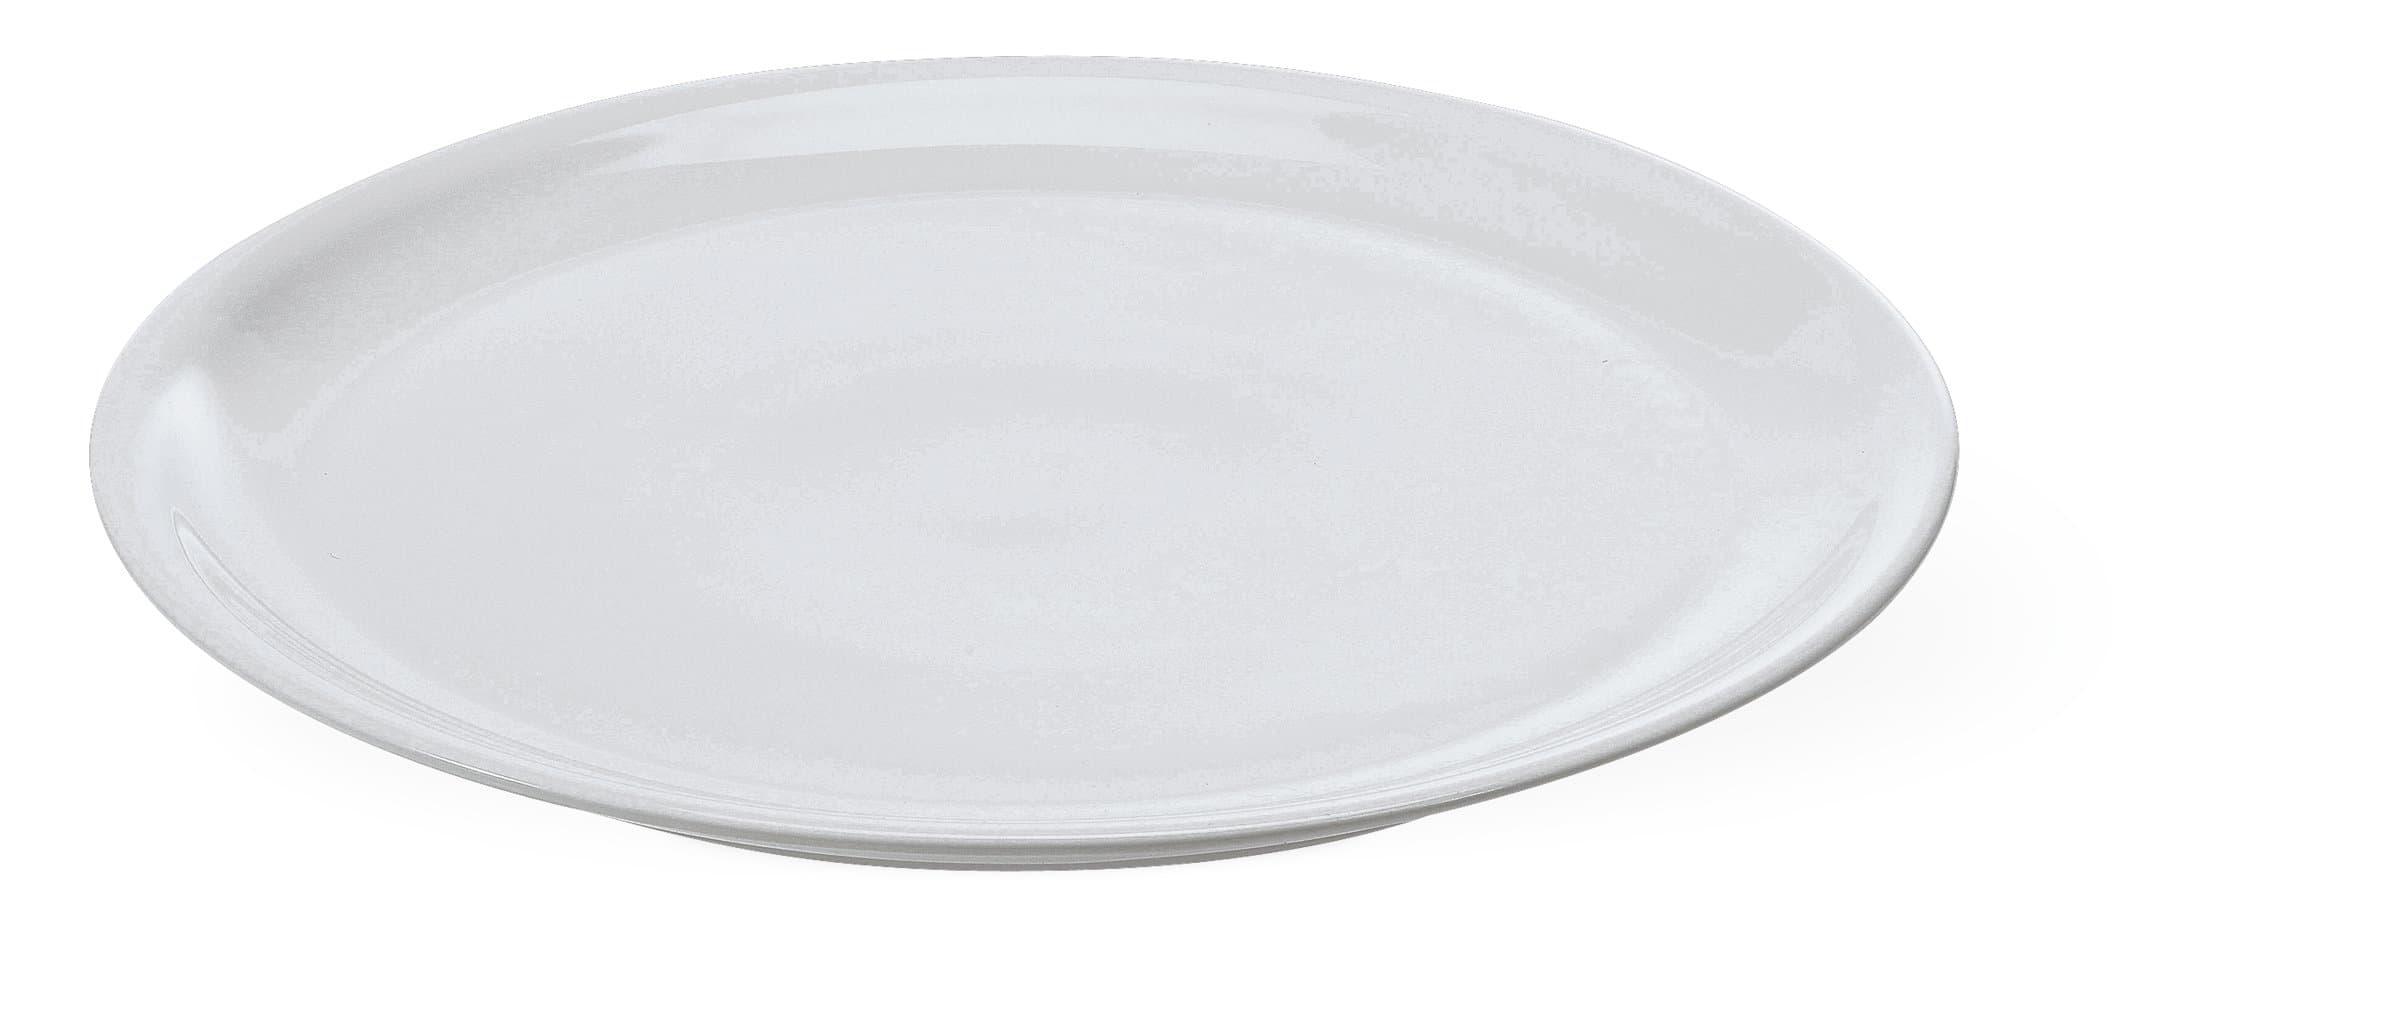 Cucina & Tavola Pizzateller